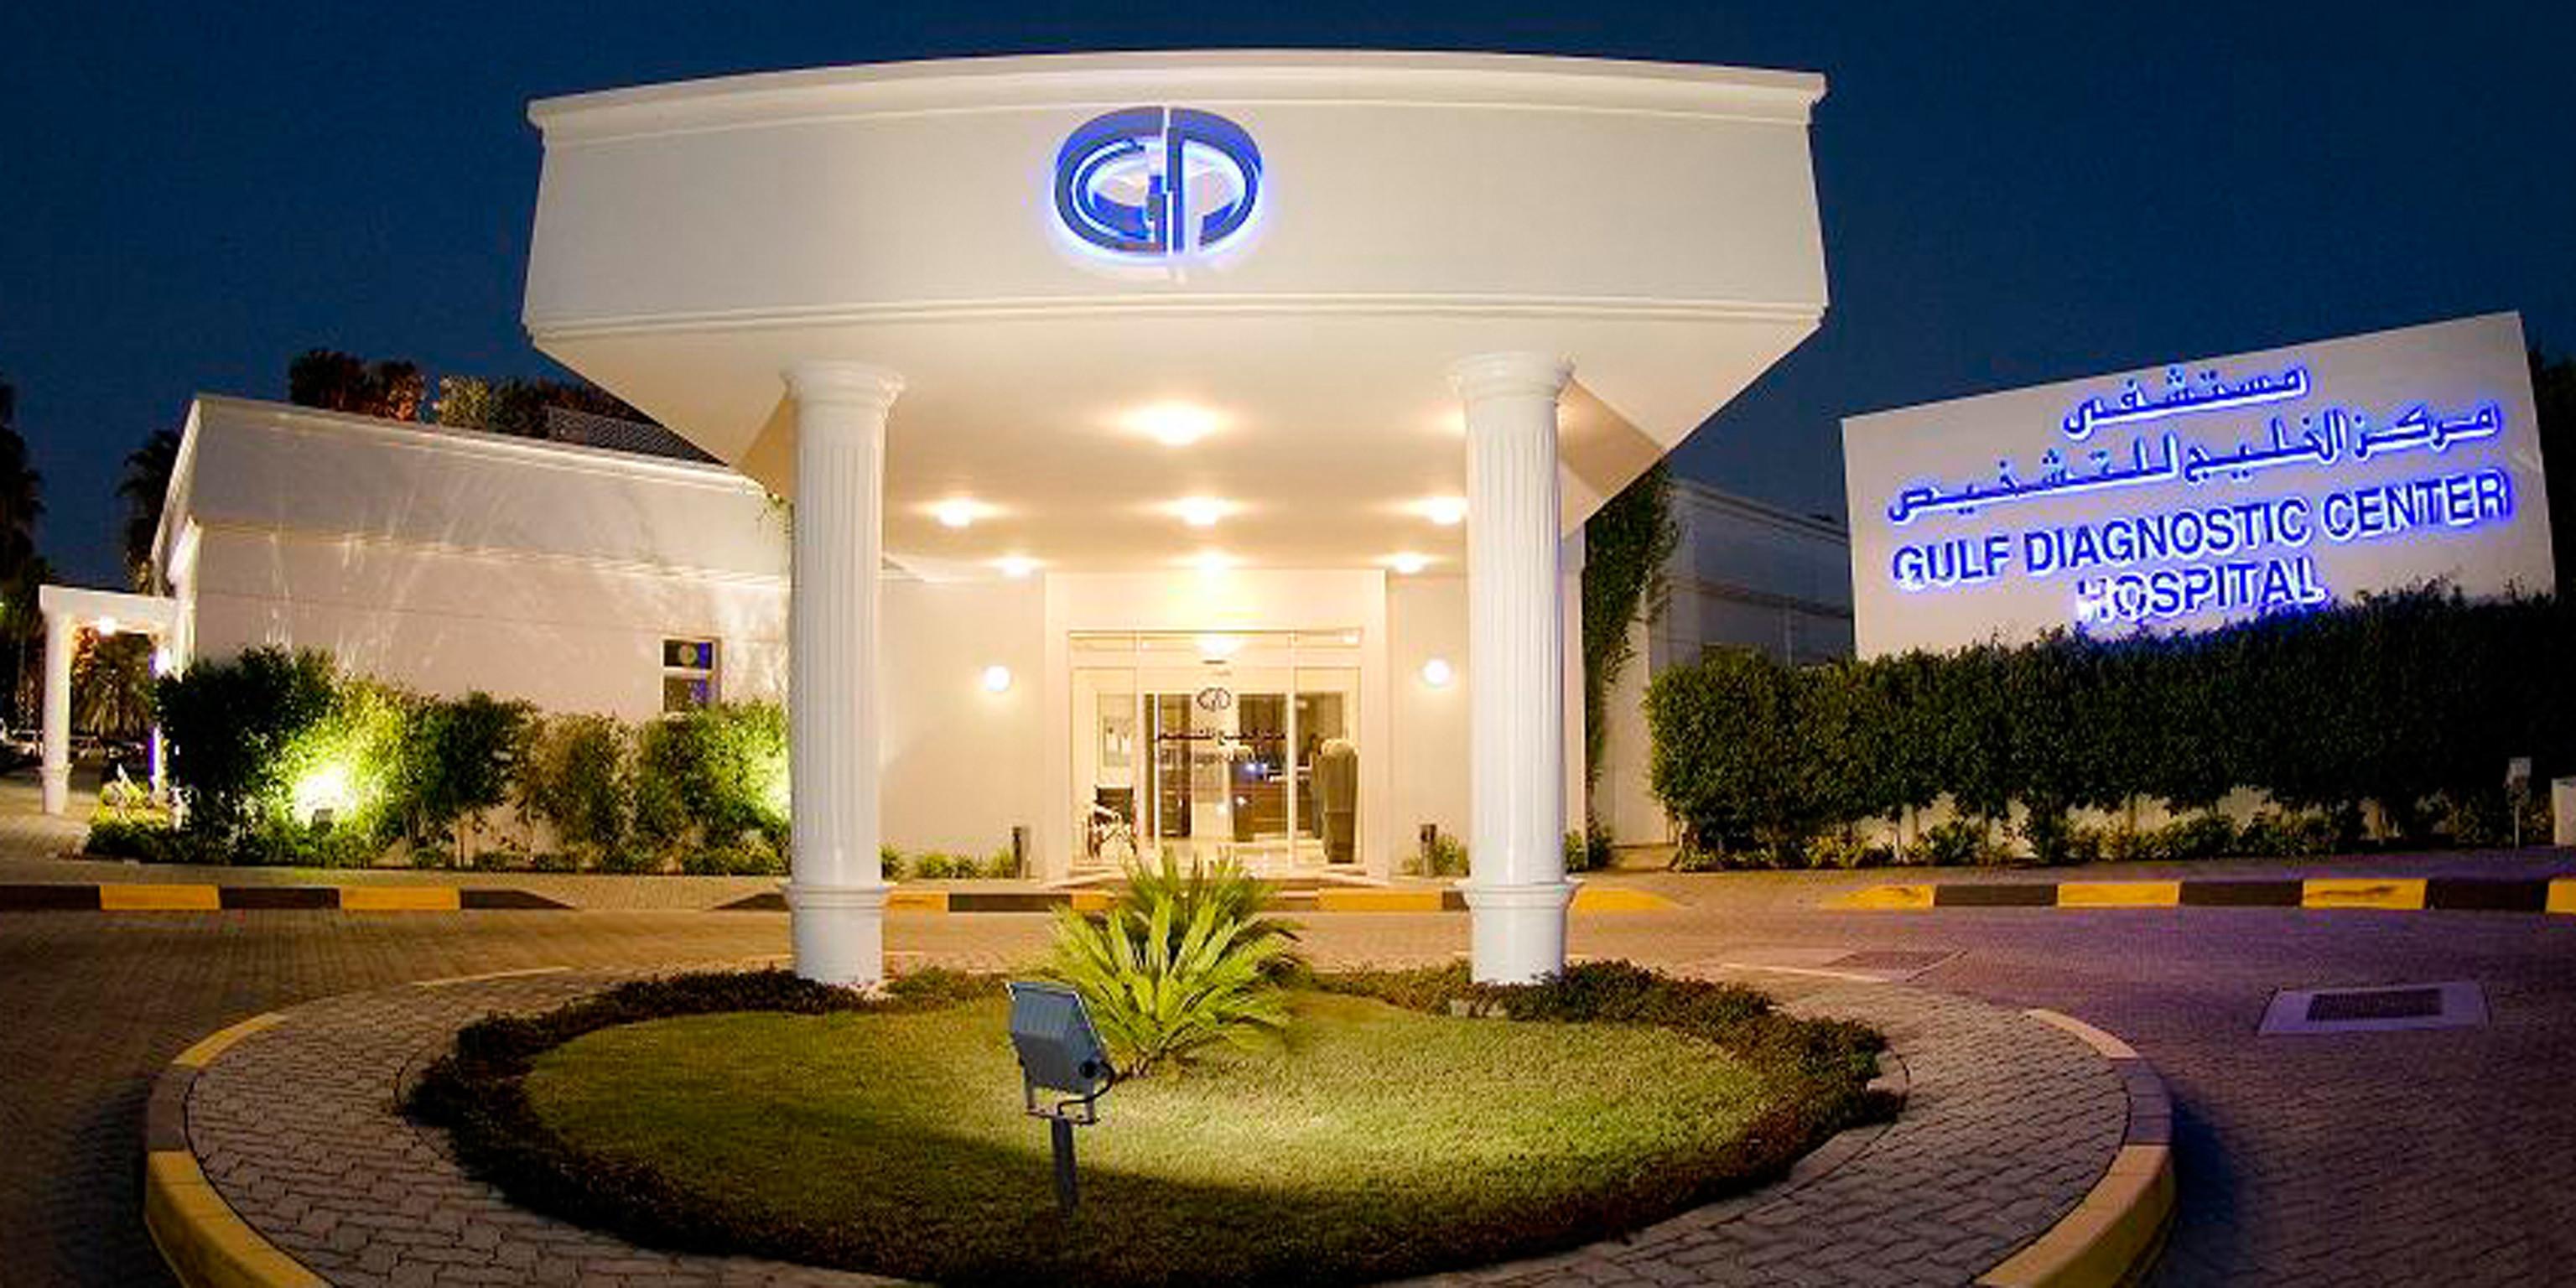 Gulf Diagnostic Center Hospital | LinkedIn